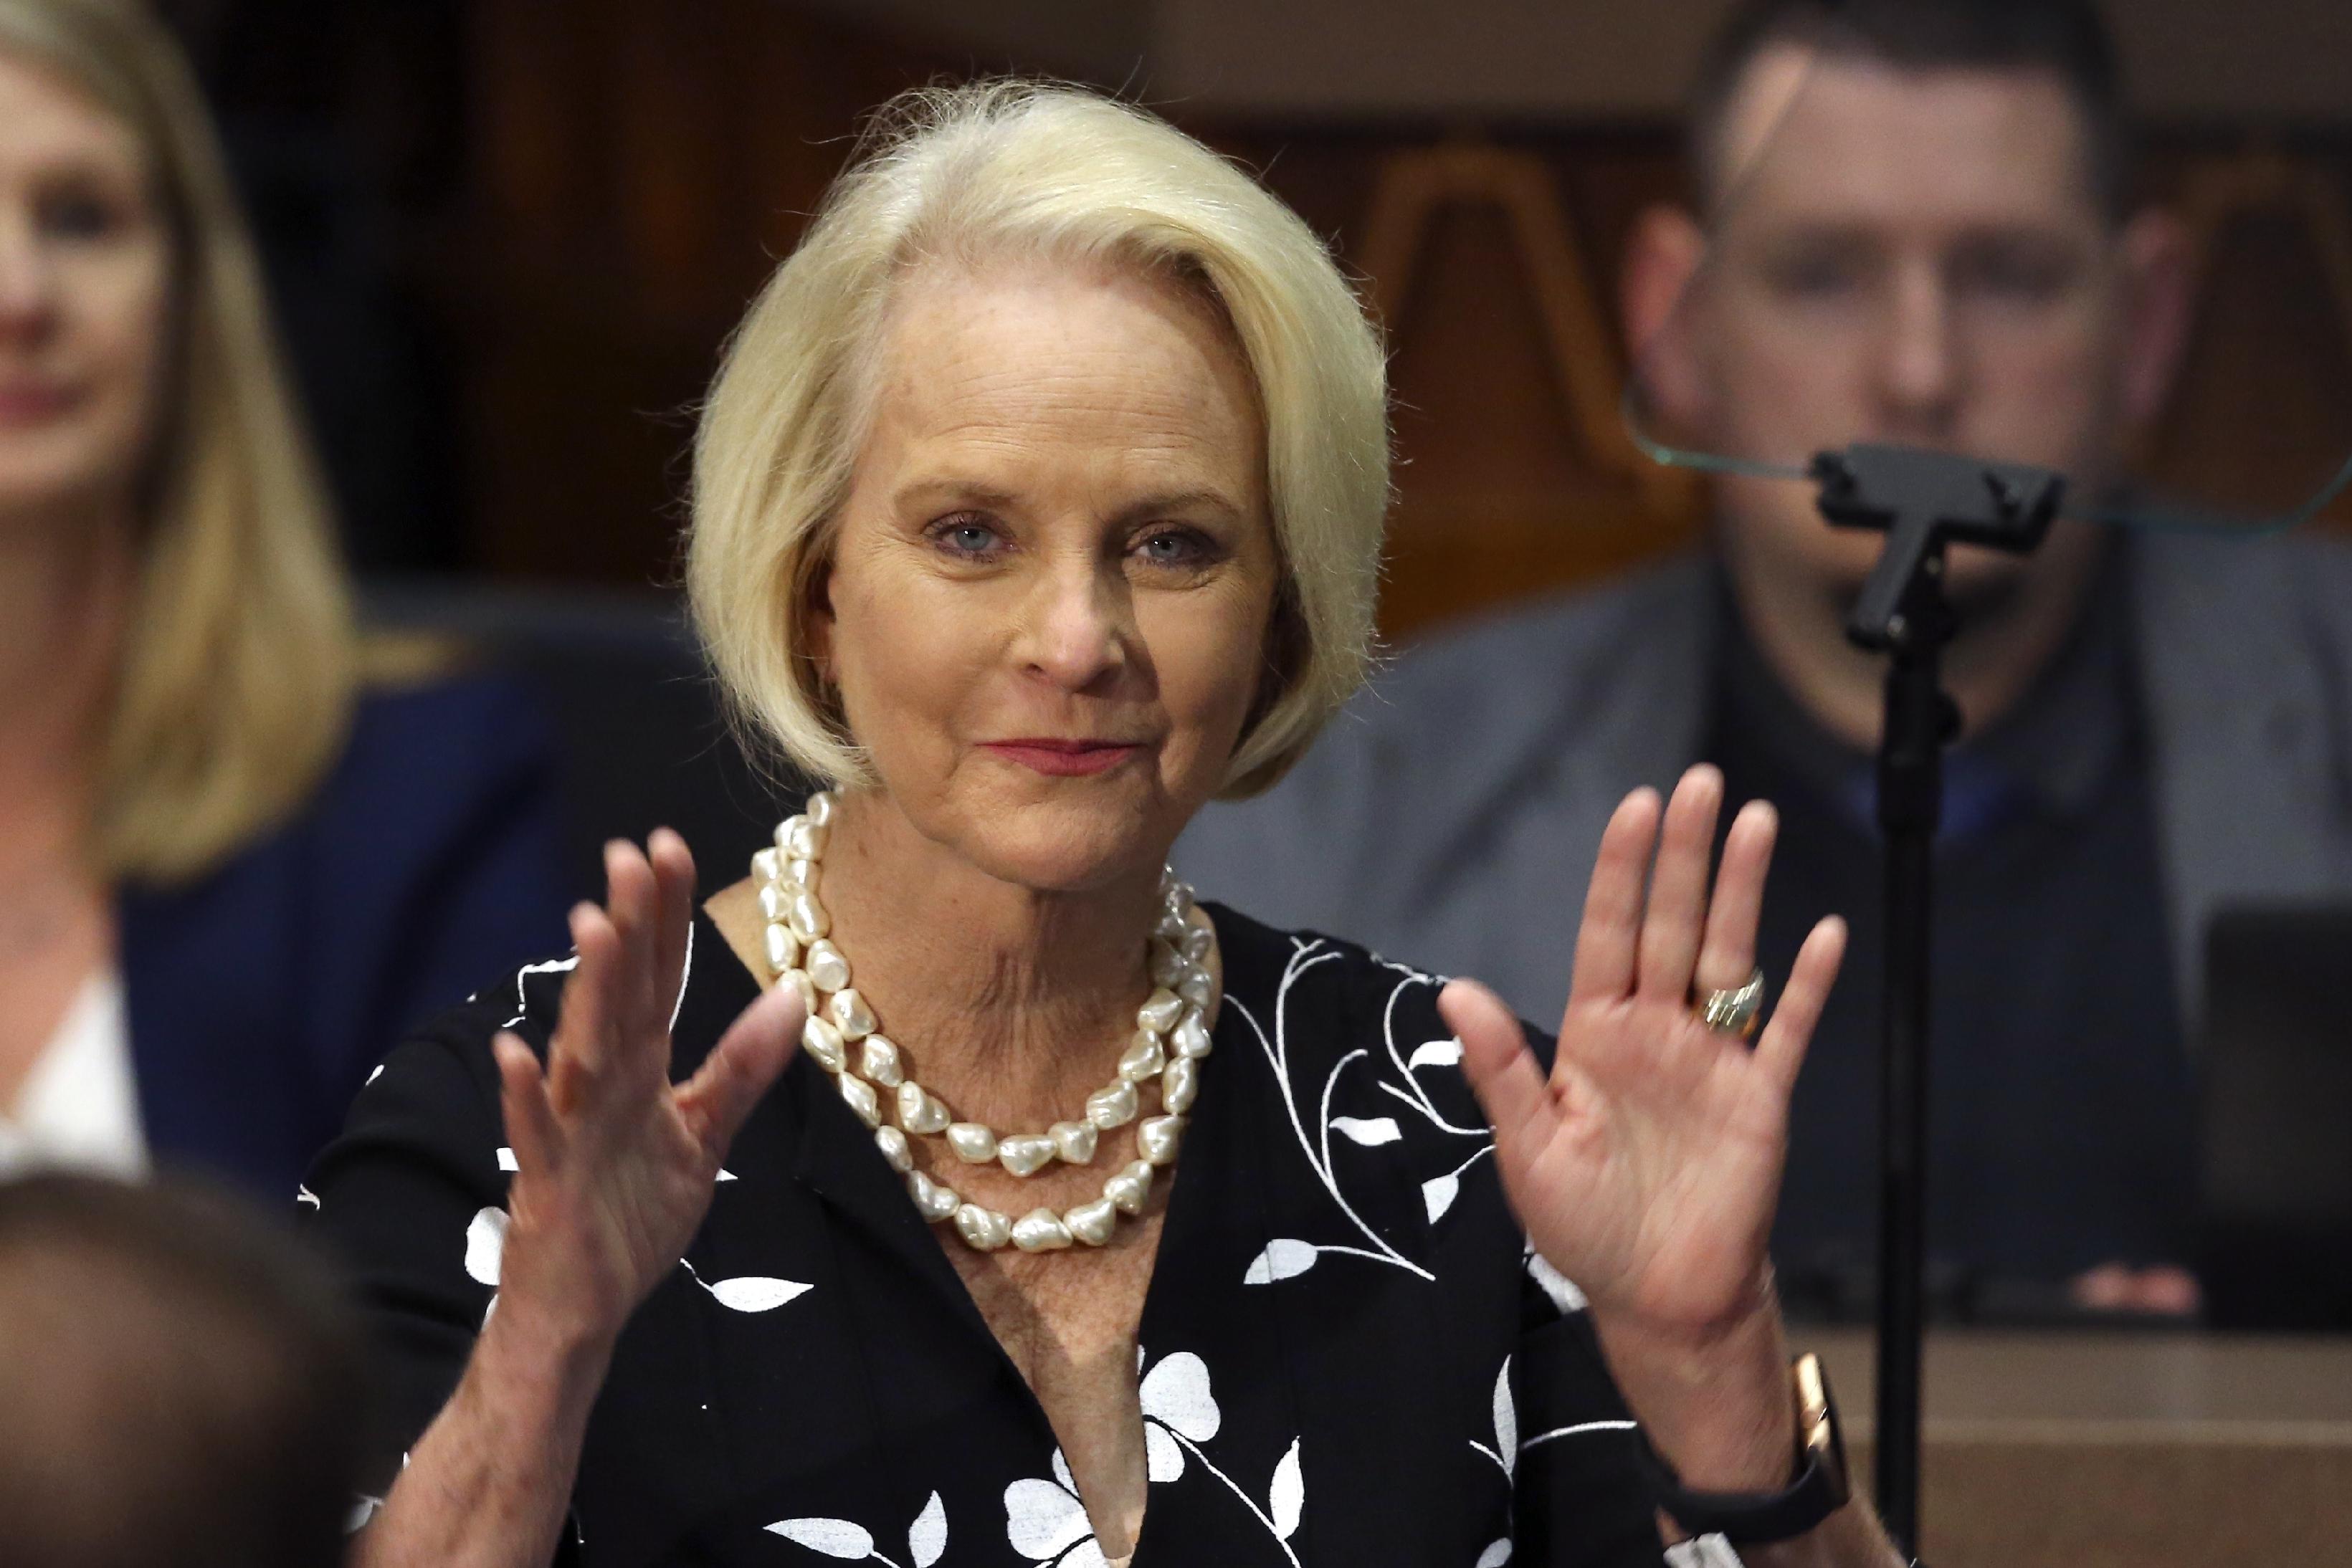 Cindy Mccain Endorses Biden For President In Rebuke Of Trump The Boston Globe